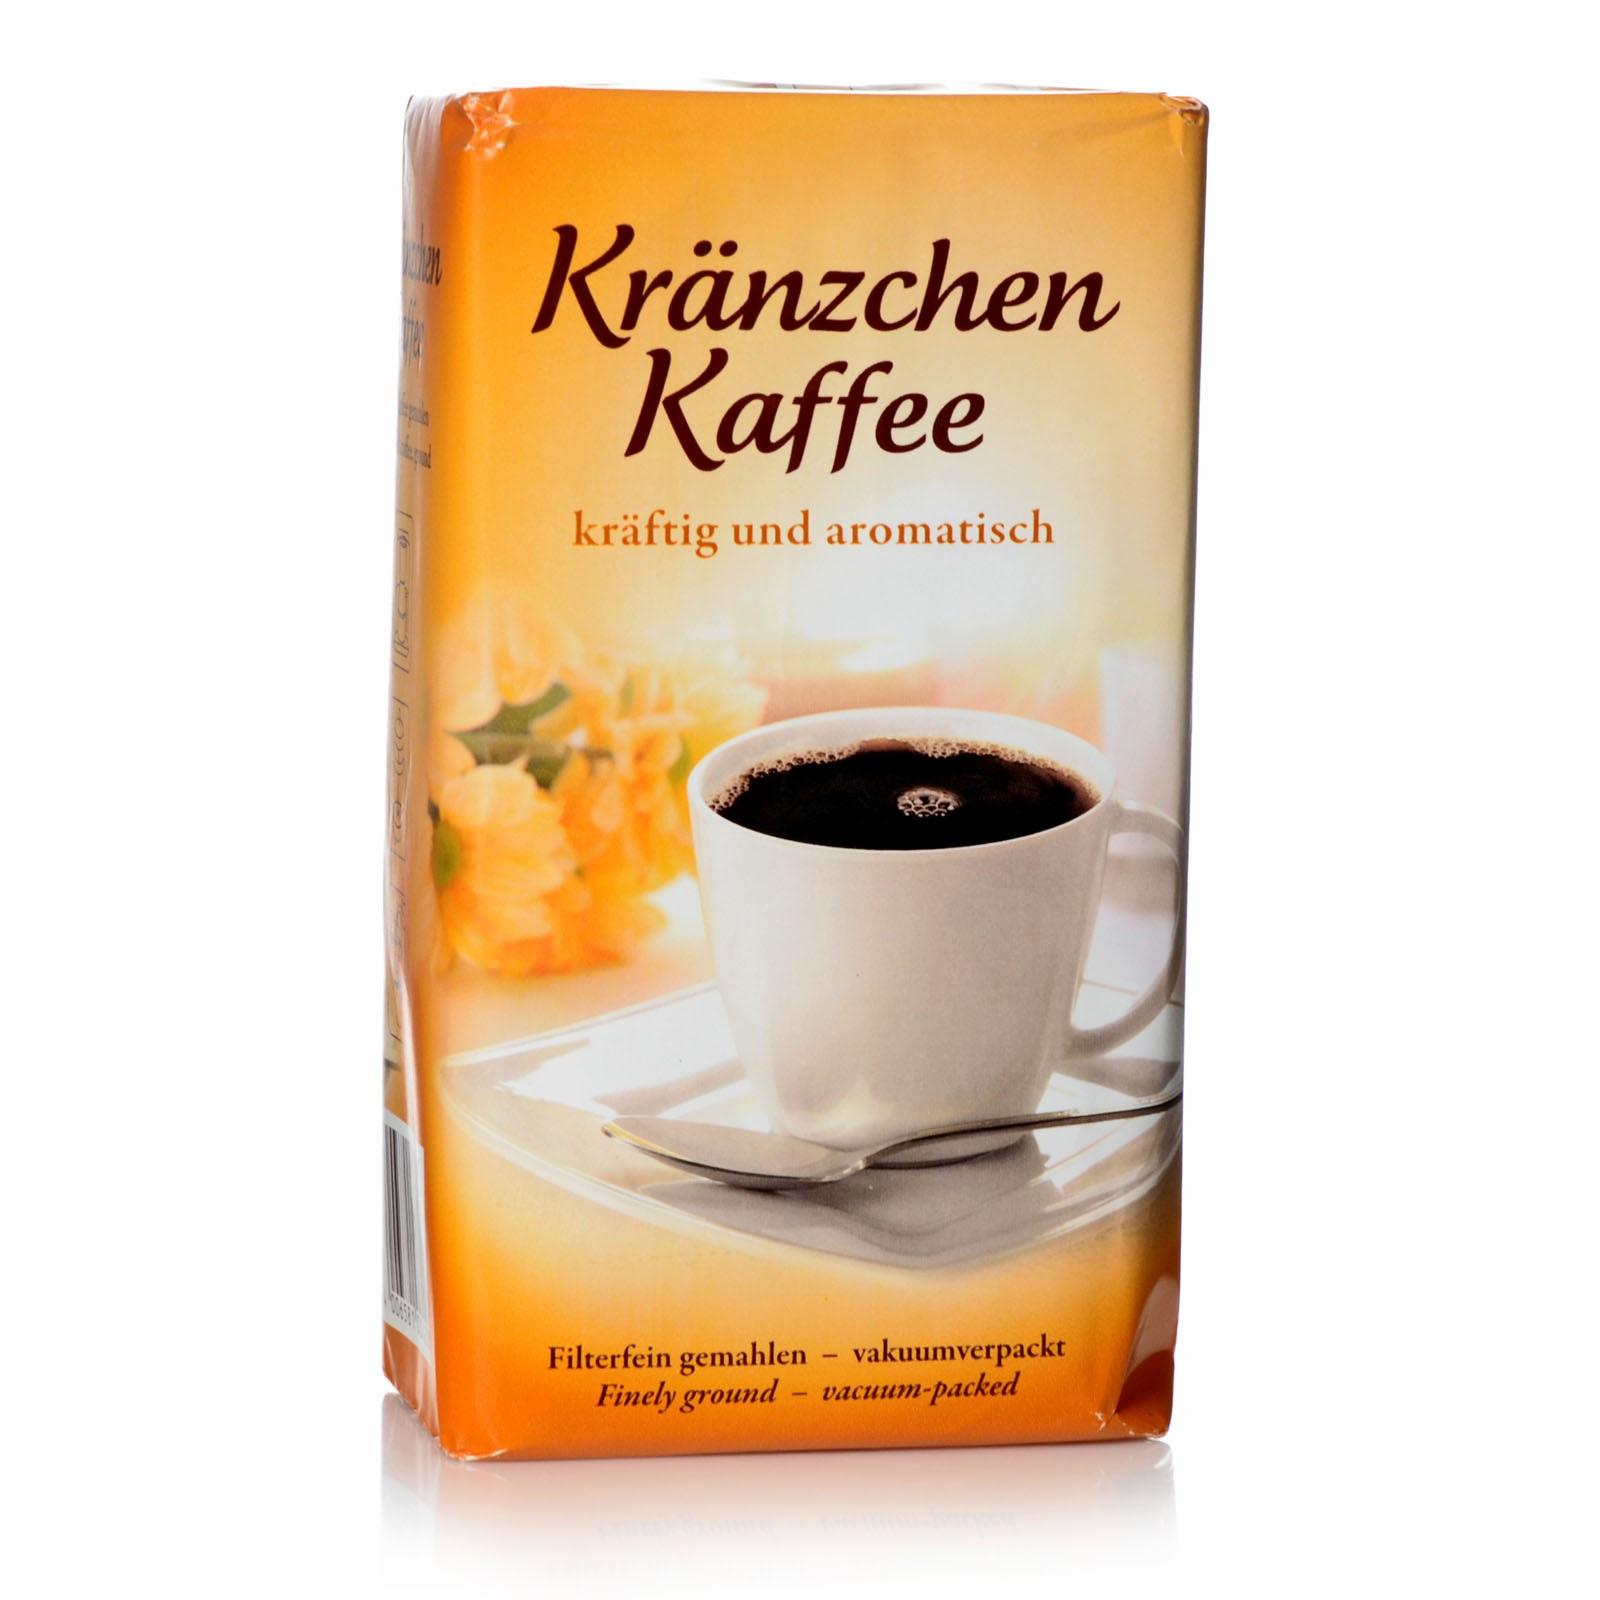 Darboven Kränzchen Kaffee 12 x 500g VP Röst-kaffee gemahlen